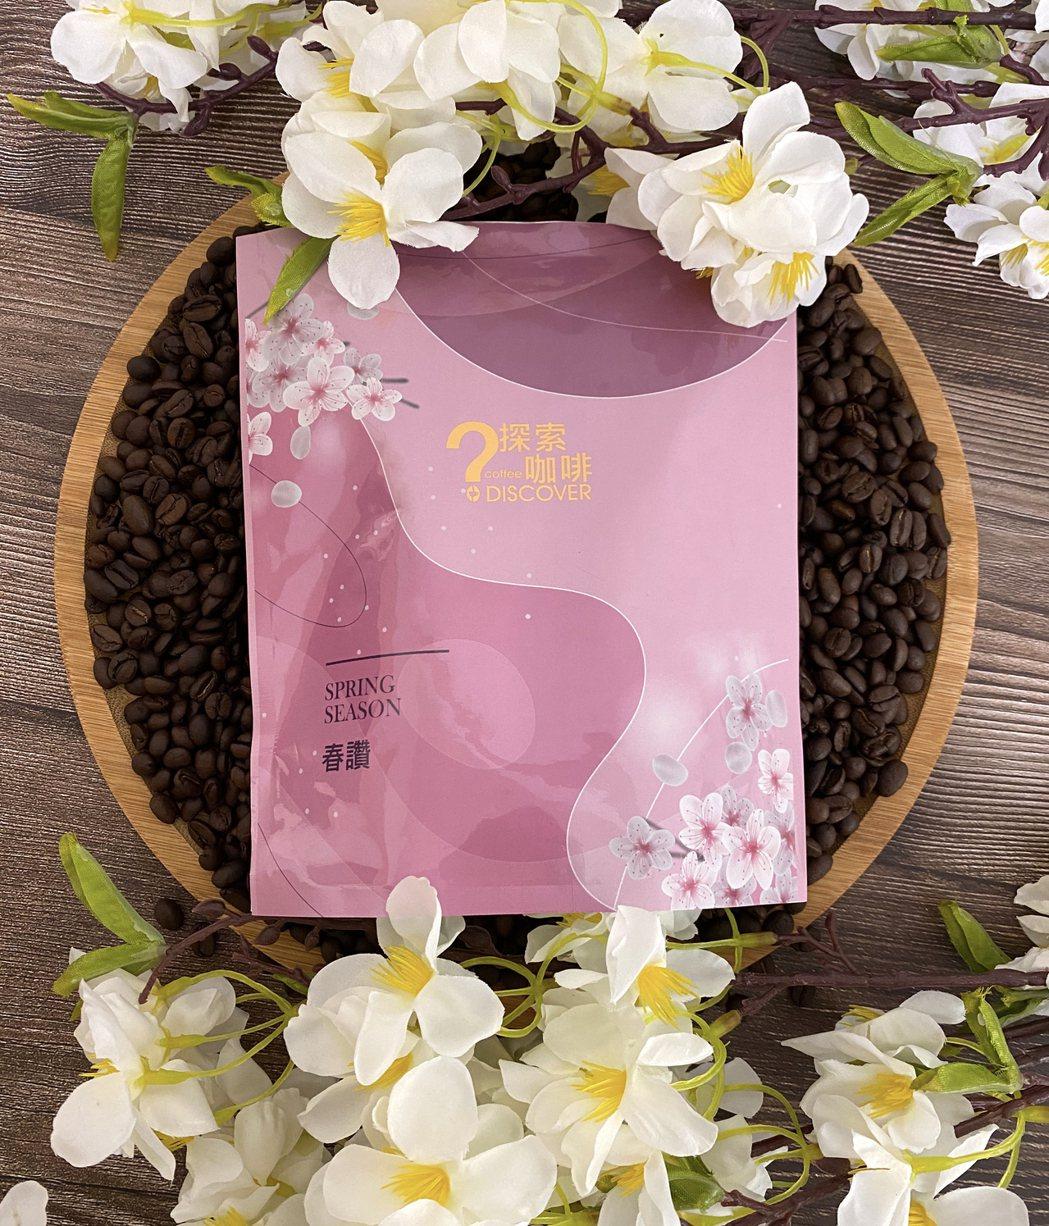 「DISCOVER COFFEE春讚-季節限定咖啡豆」日前在東森電視購物第46頻...